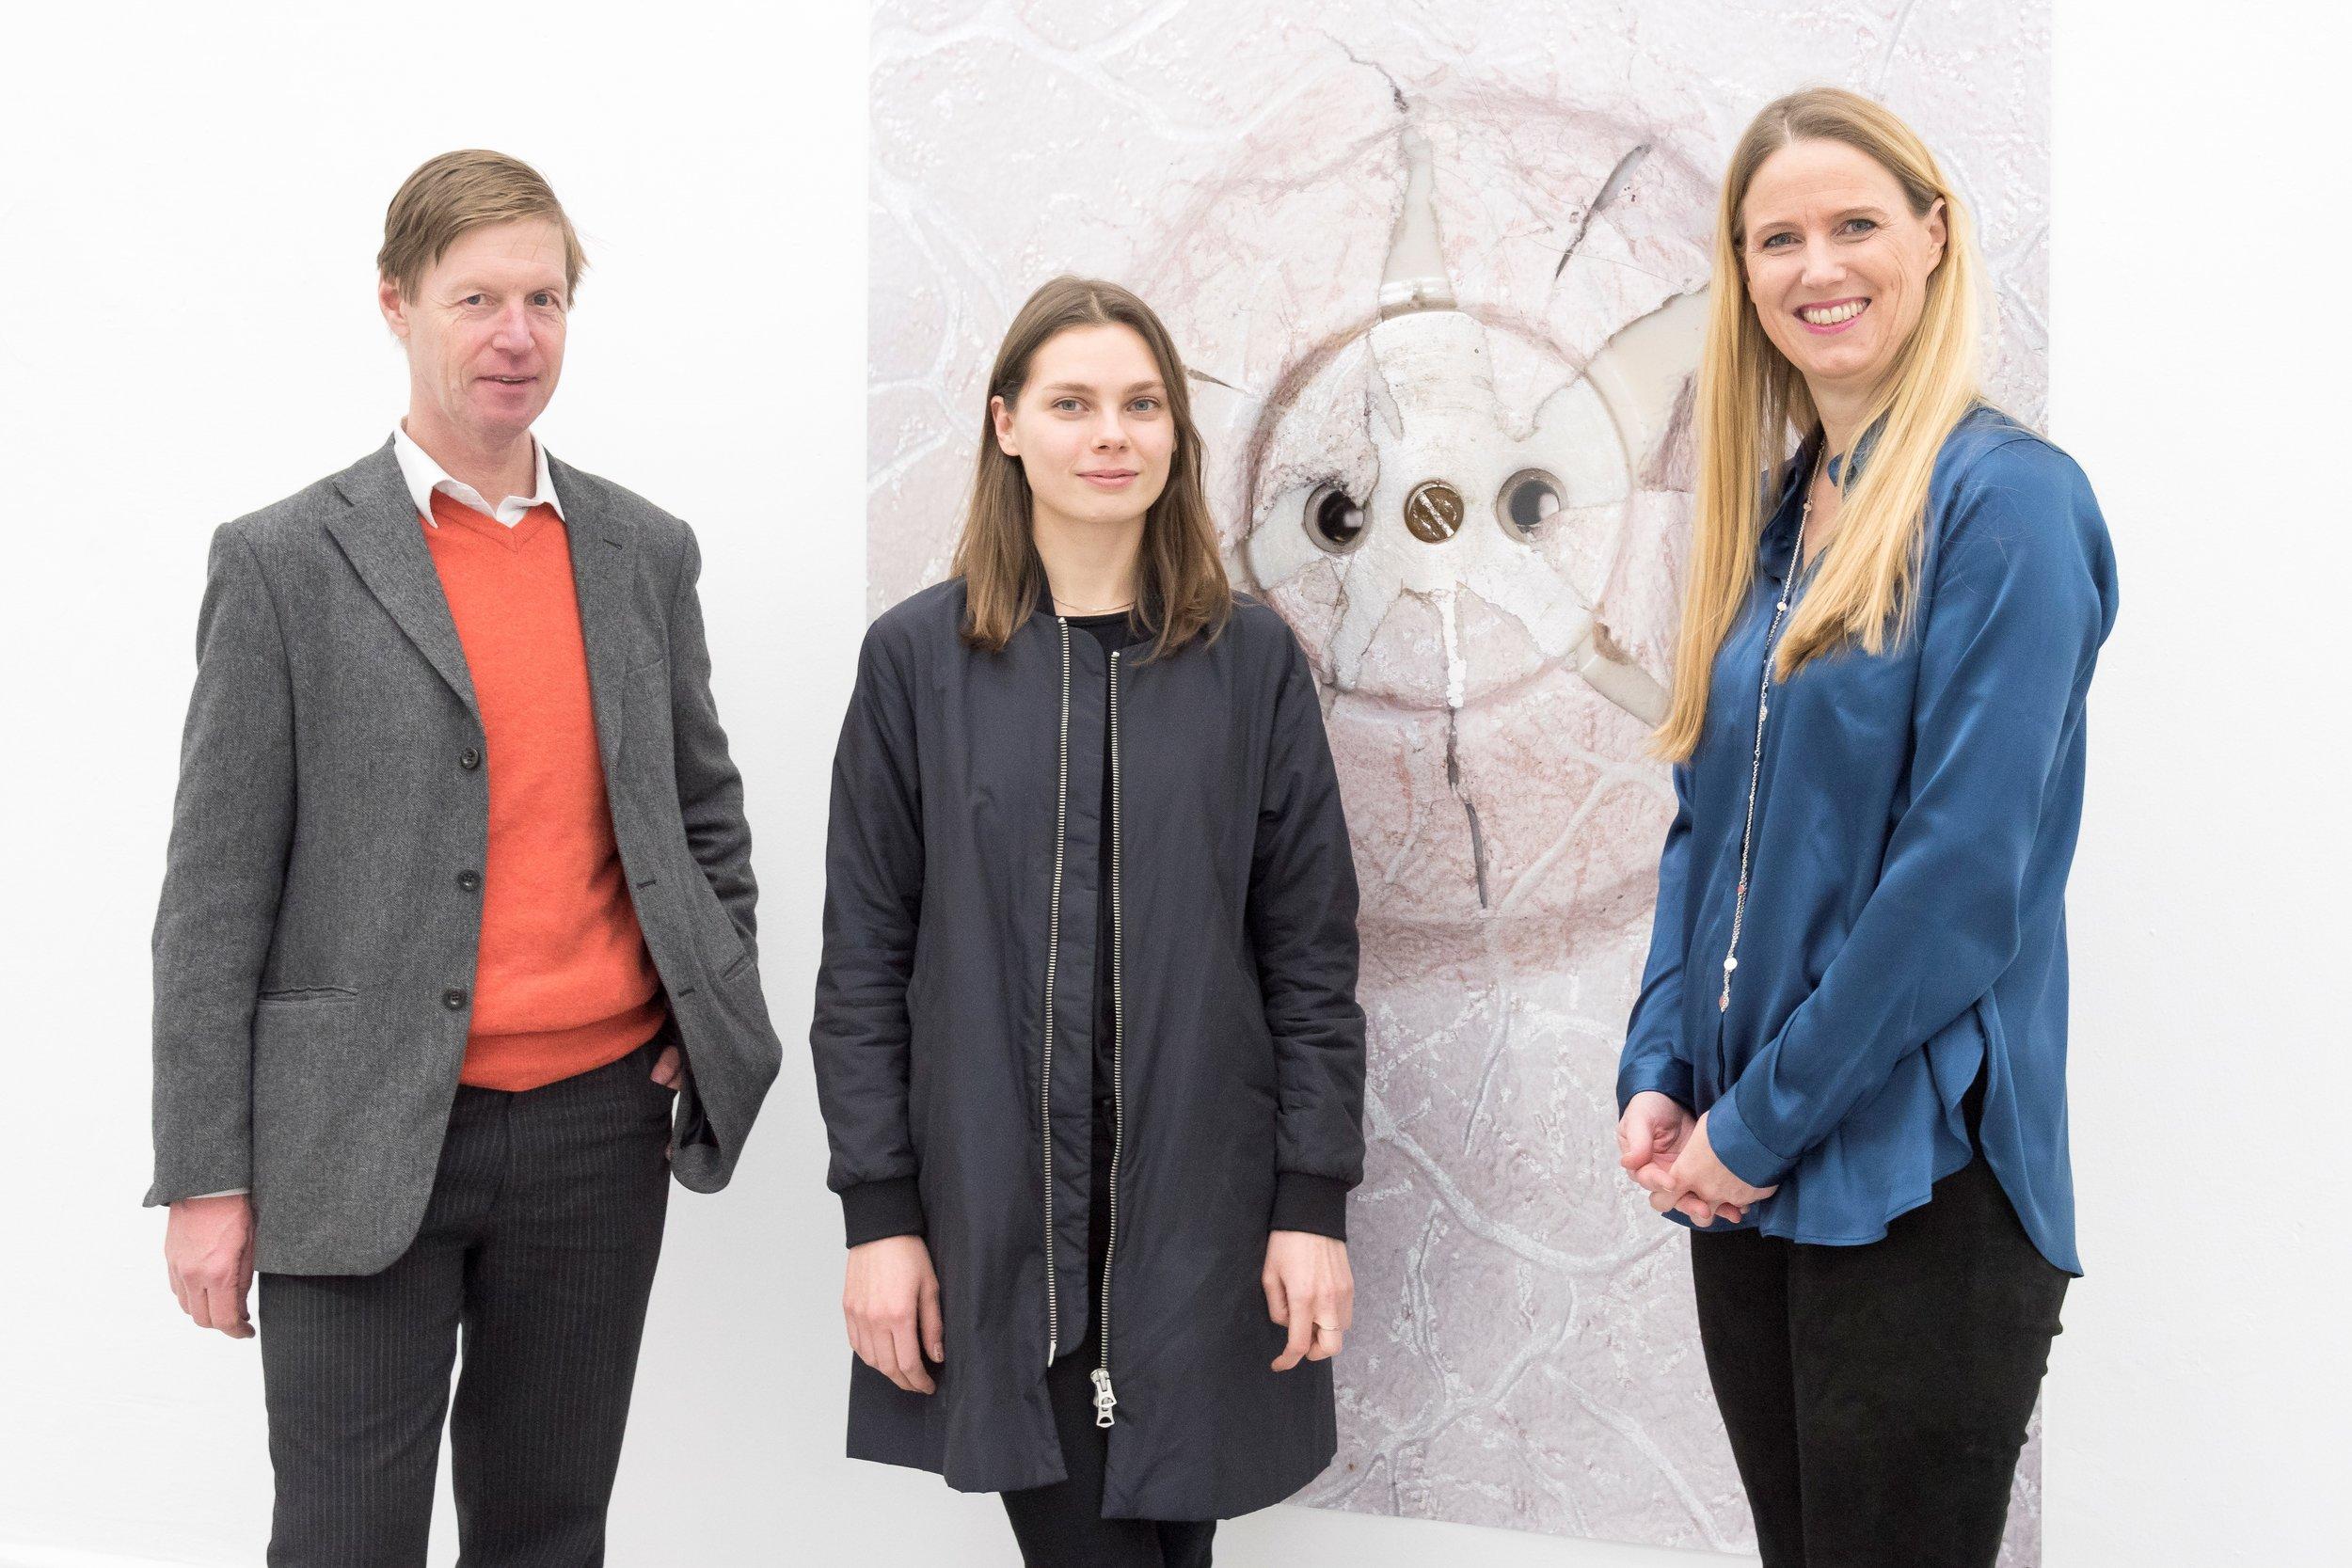 v.l.n.r.: Professor Dr. Fleck, Förderpreis-Stipendiatin 2018 Lucia Sotnikova, Dr. Friderike Bagel, Vorsitzende der Freunde und Förderer, Foto © Moritz Krauth.